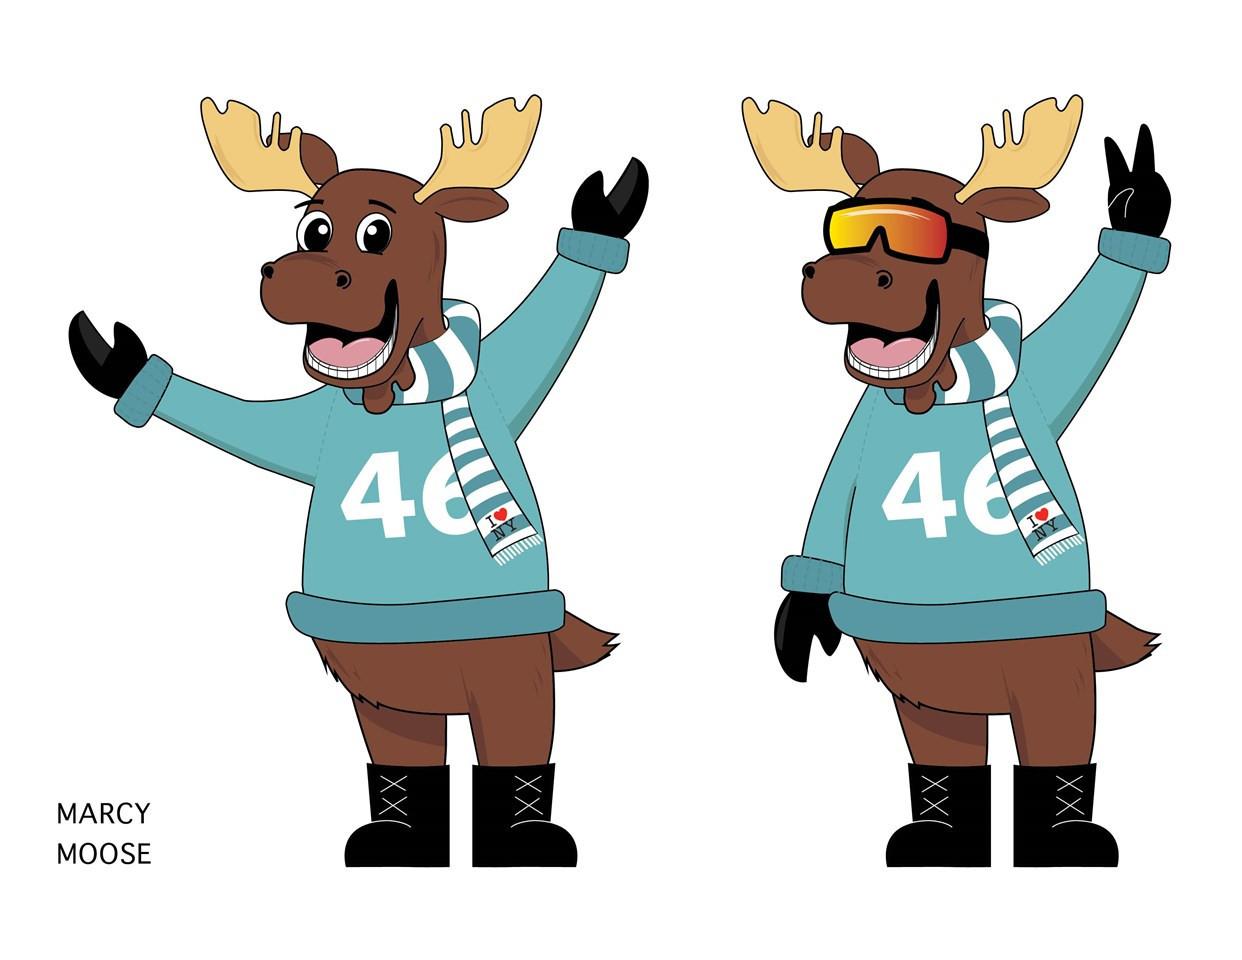 Elisa Medina submitted the Marcy Moose design ©I Love NY